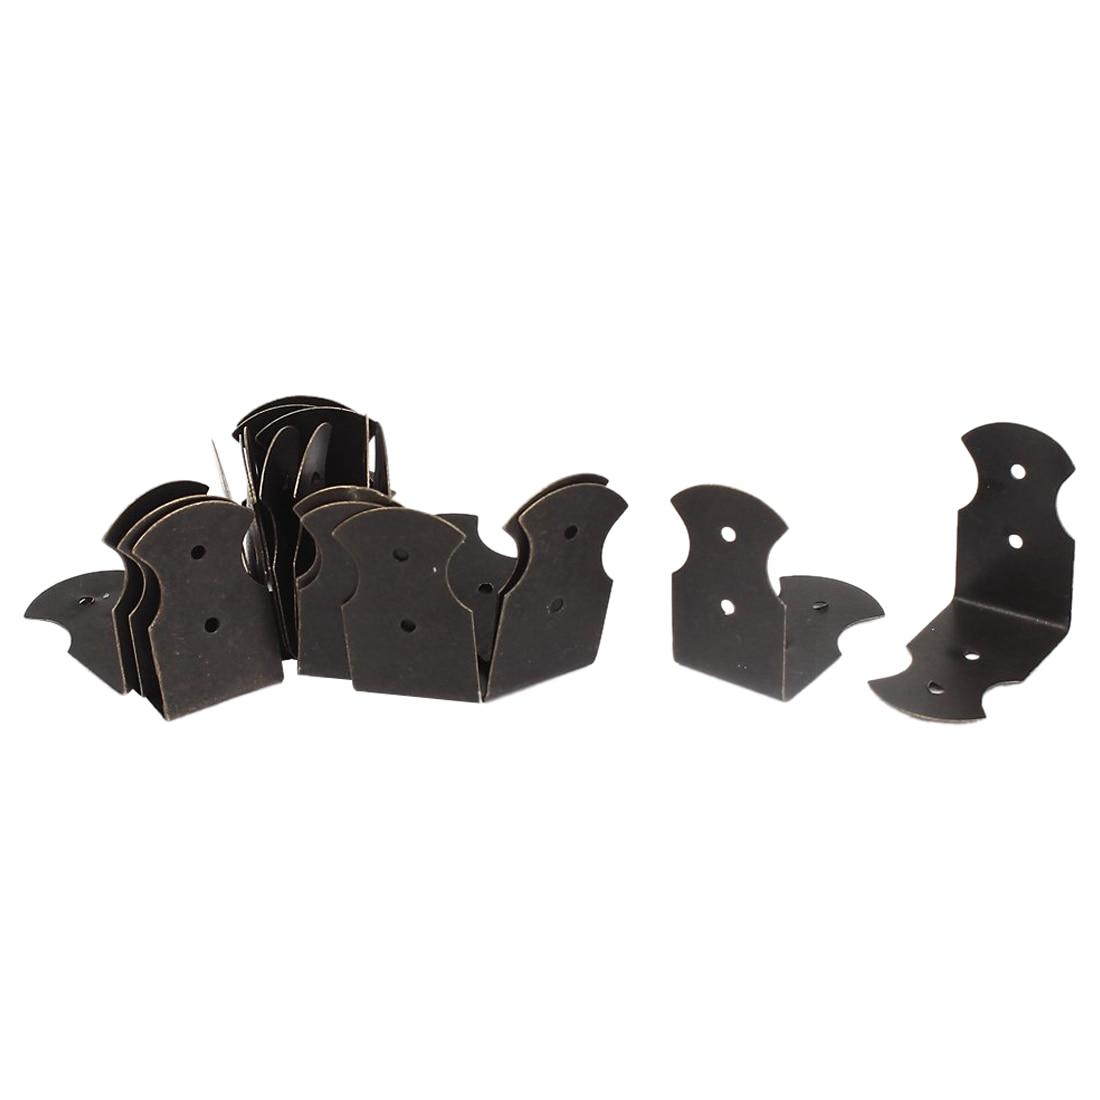 Box Desk Edge Cover Corner Brace Protectors Decorative 25x25mm 20pcs